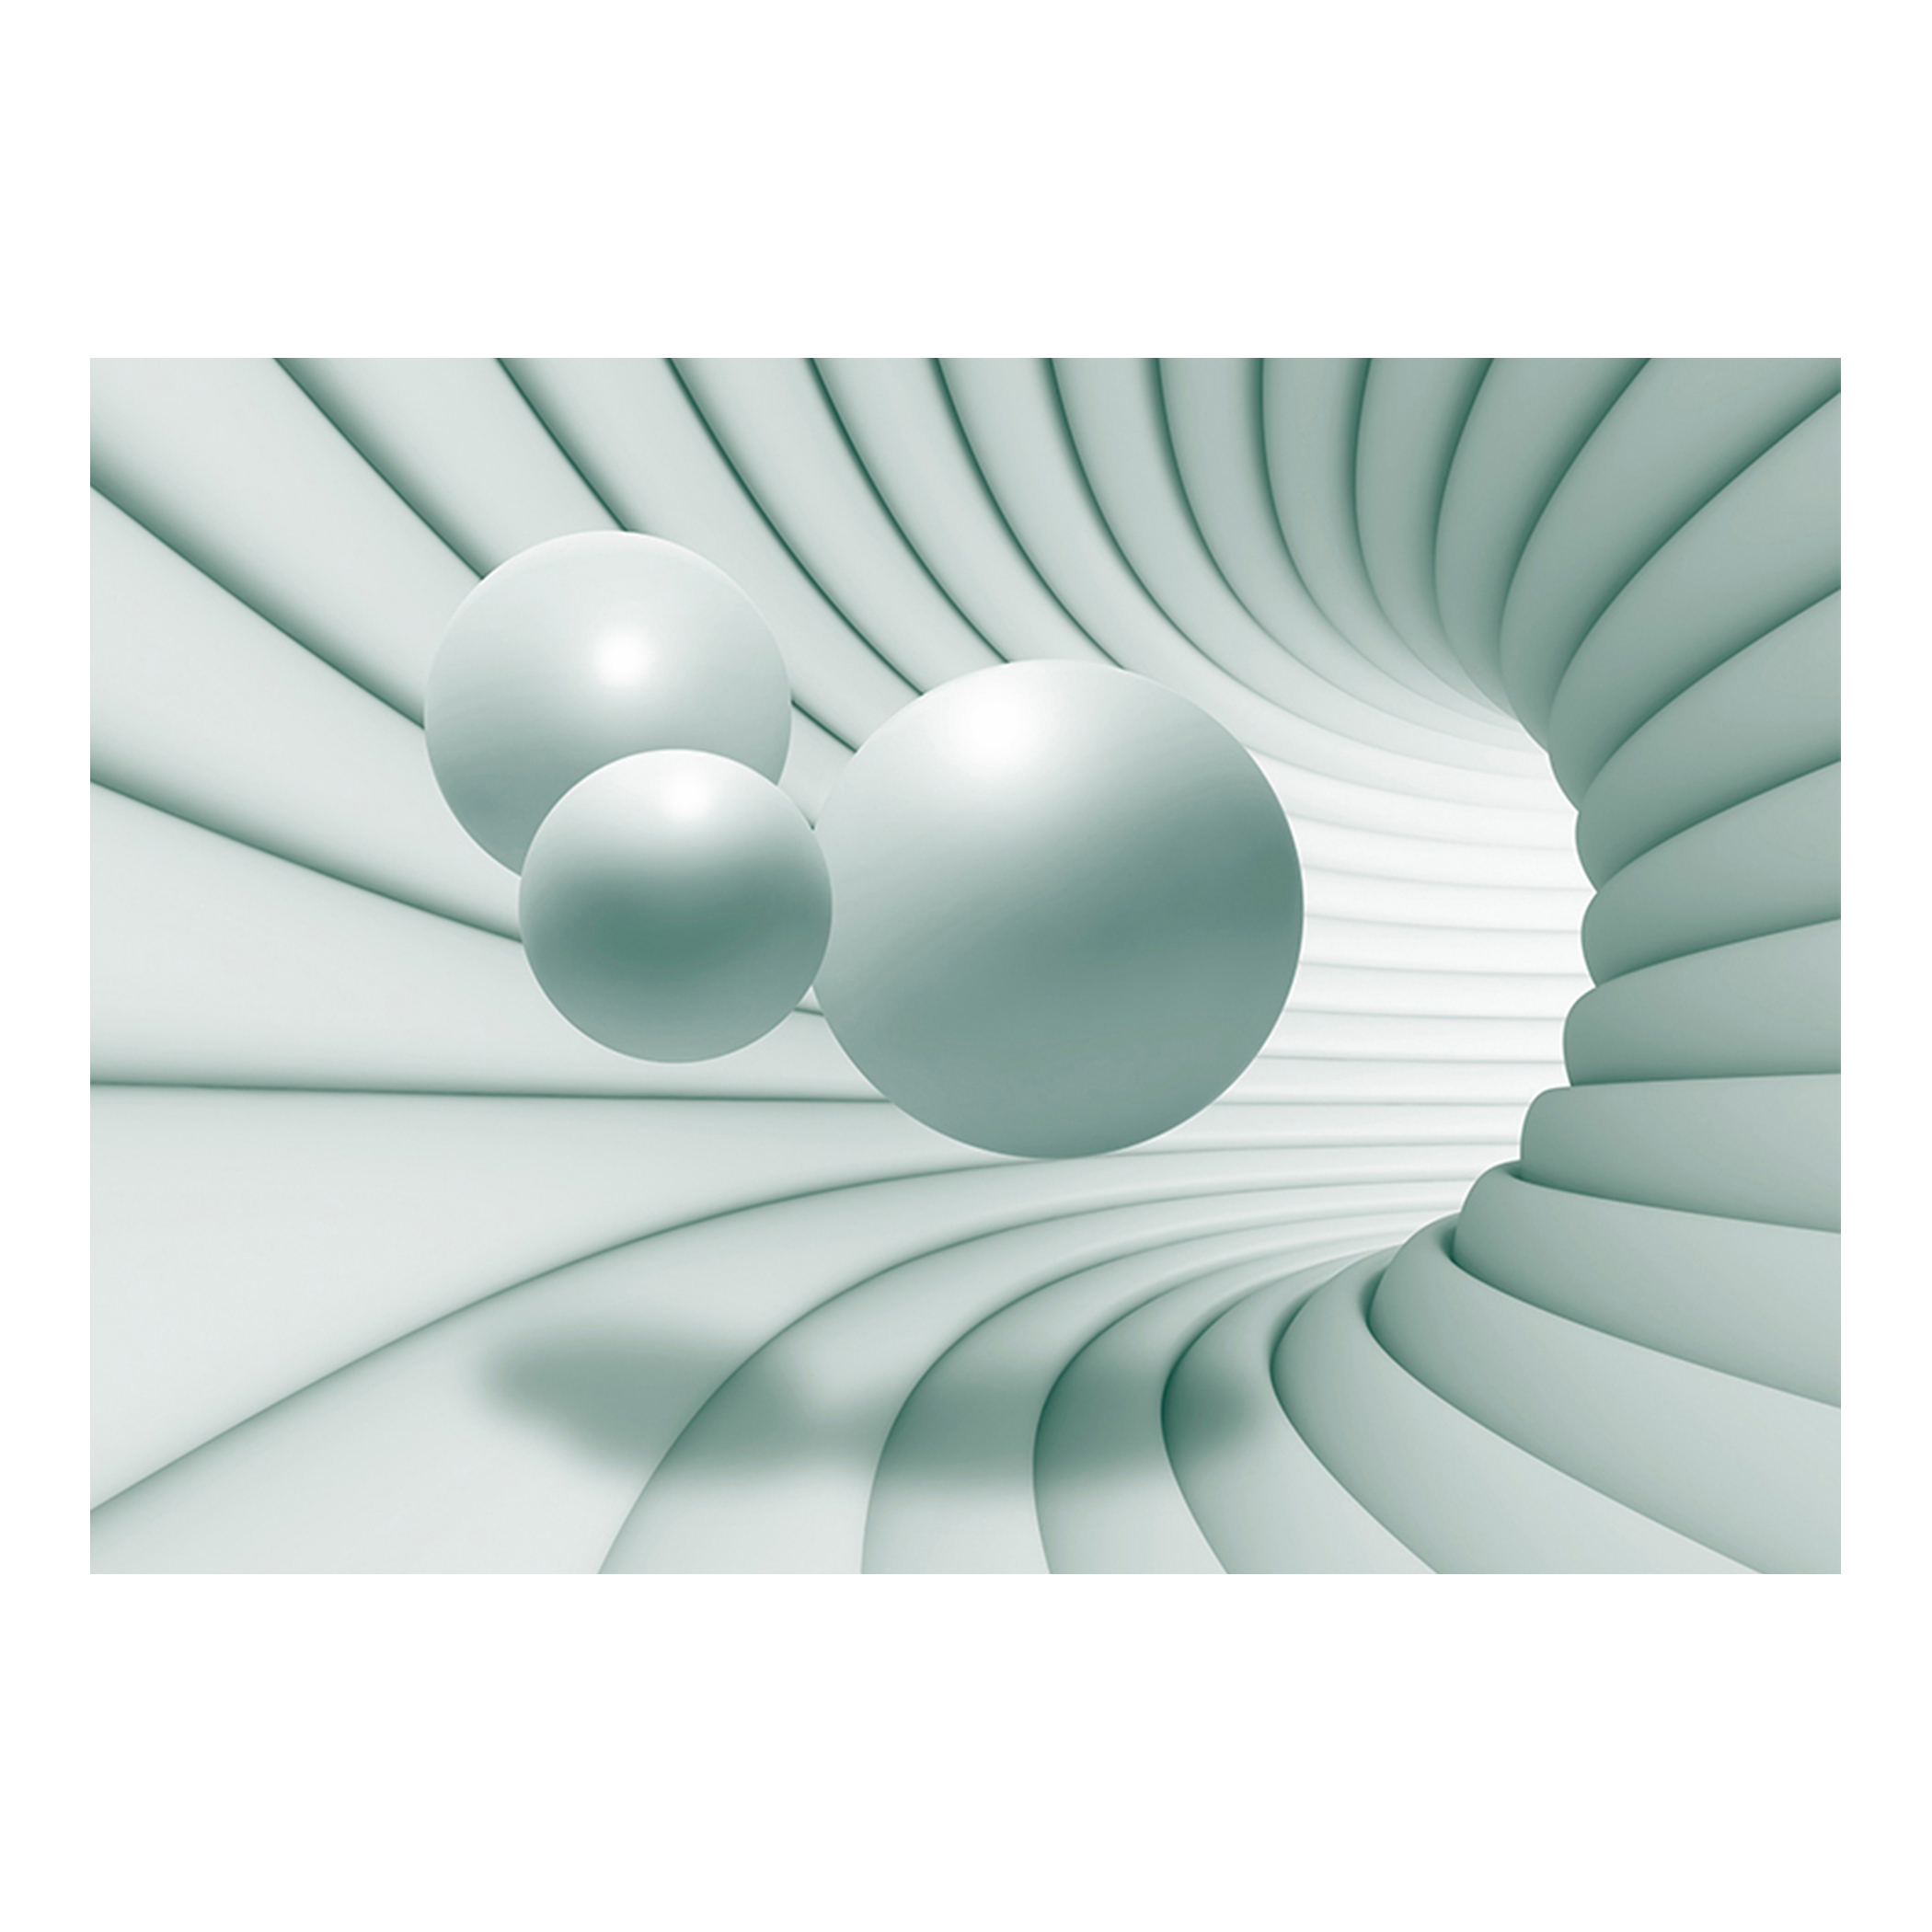 vlies fototapete 3d effekt kugeln tunnel tapete beige wei wandbild gro auswahl ebay. Black Bedroom Furniture Sets. Home Design Ideas